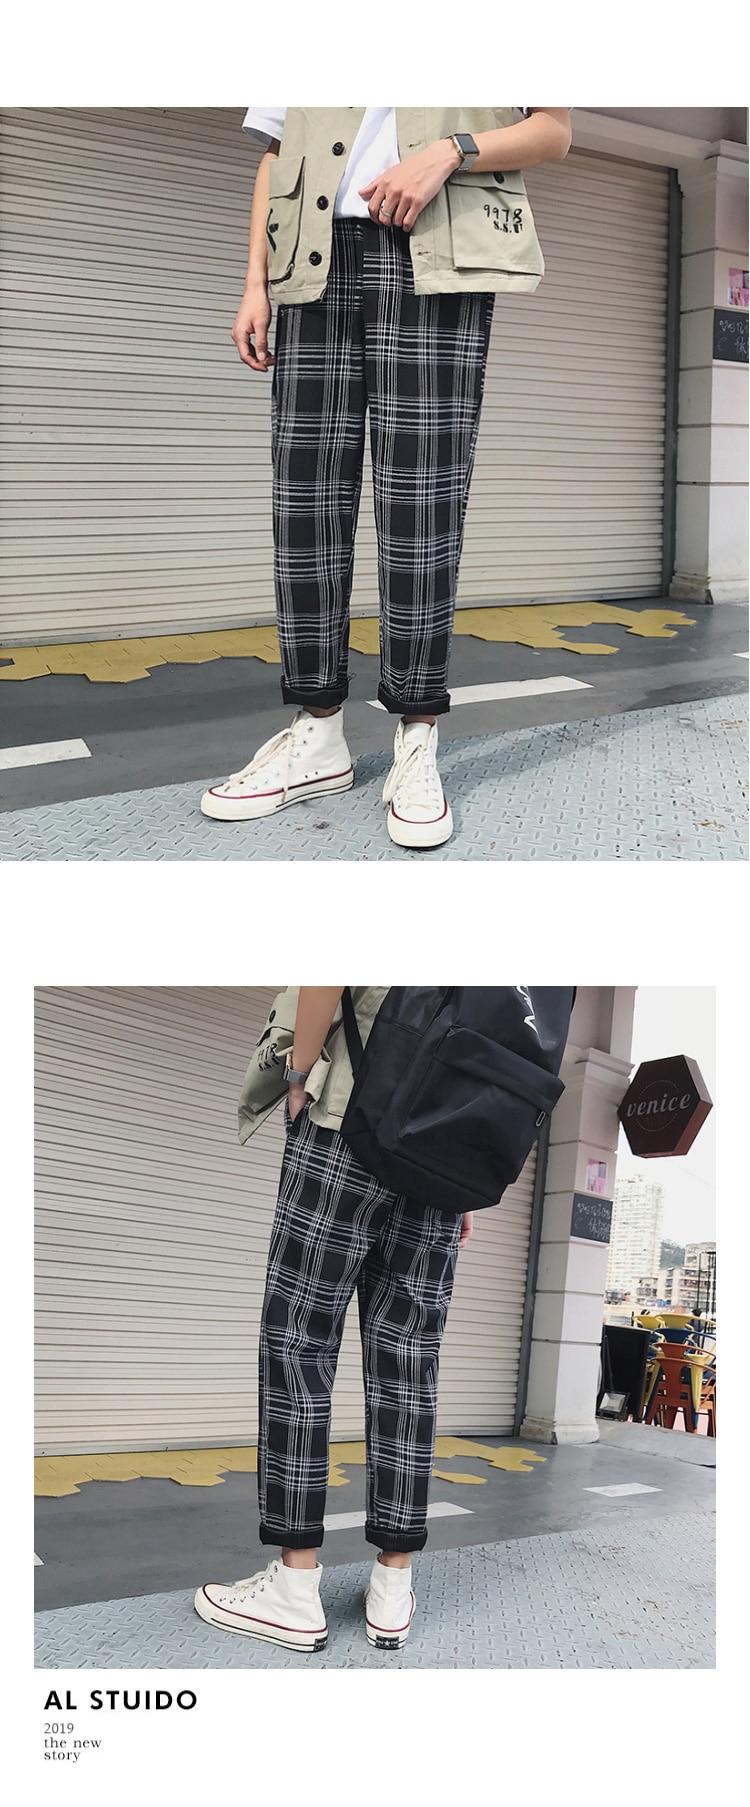 LAPPSTER Streetwear Yellow Plaid Pants Men Joggers 19 Man Casual Straight Harem Pants Men Korean Hip Hop Track Pants Plus Size 9